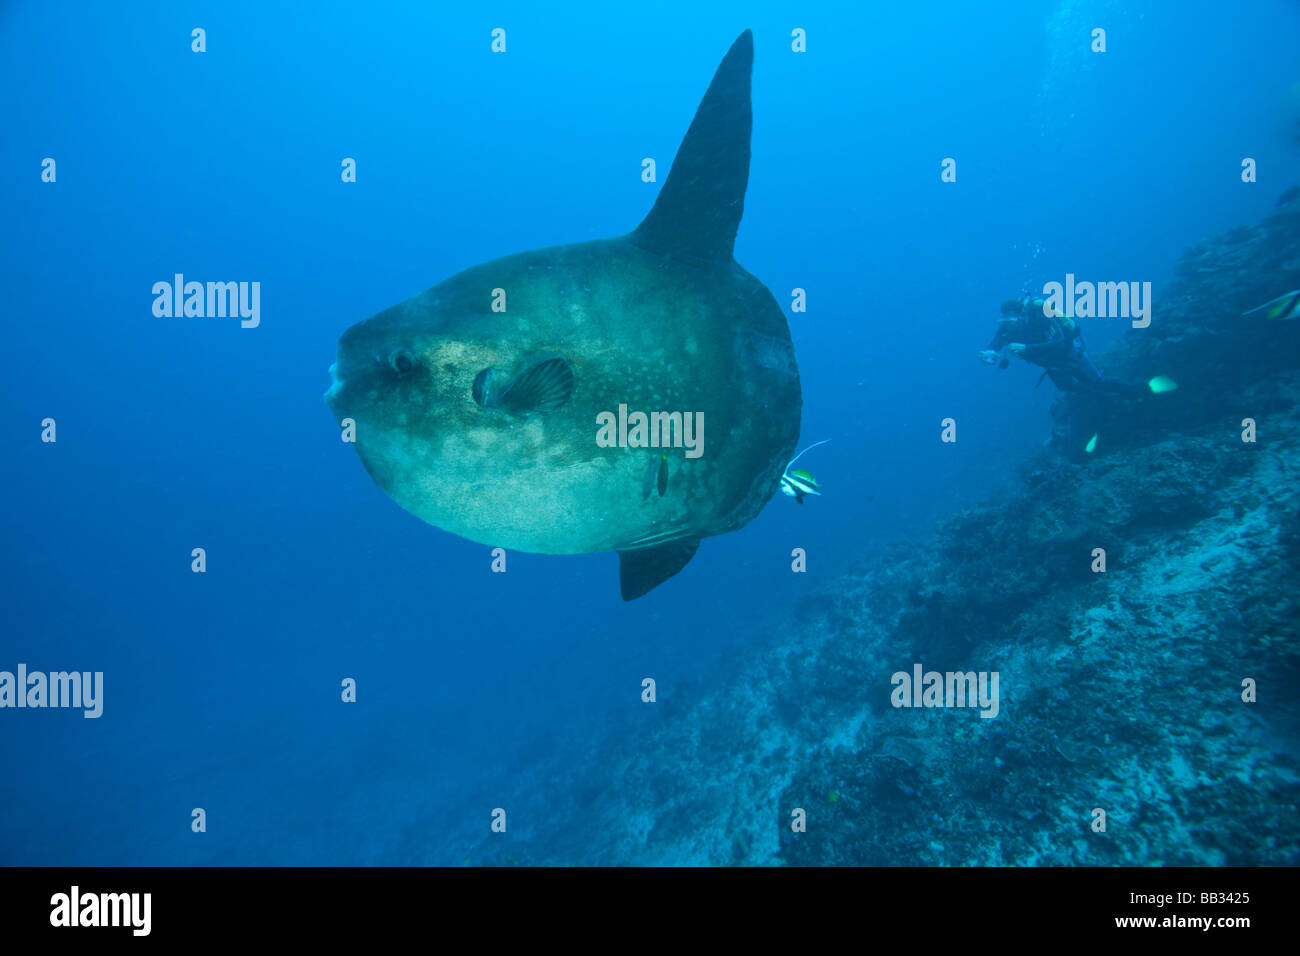 Mola Mola Photos Mola Mola Images Alamy